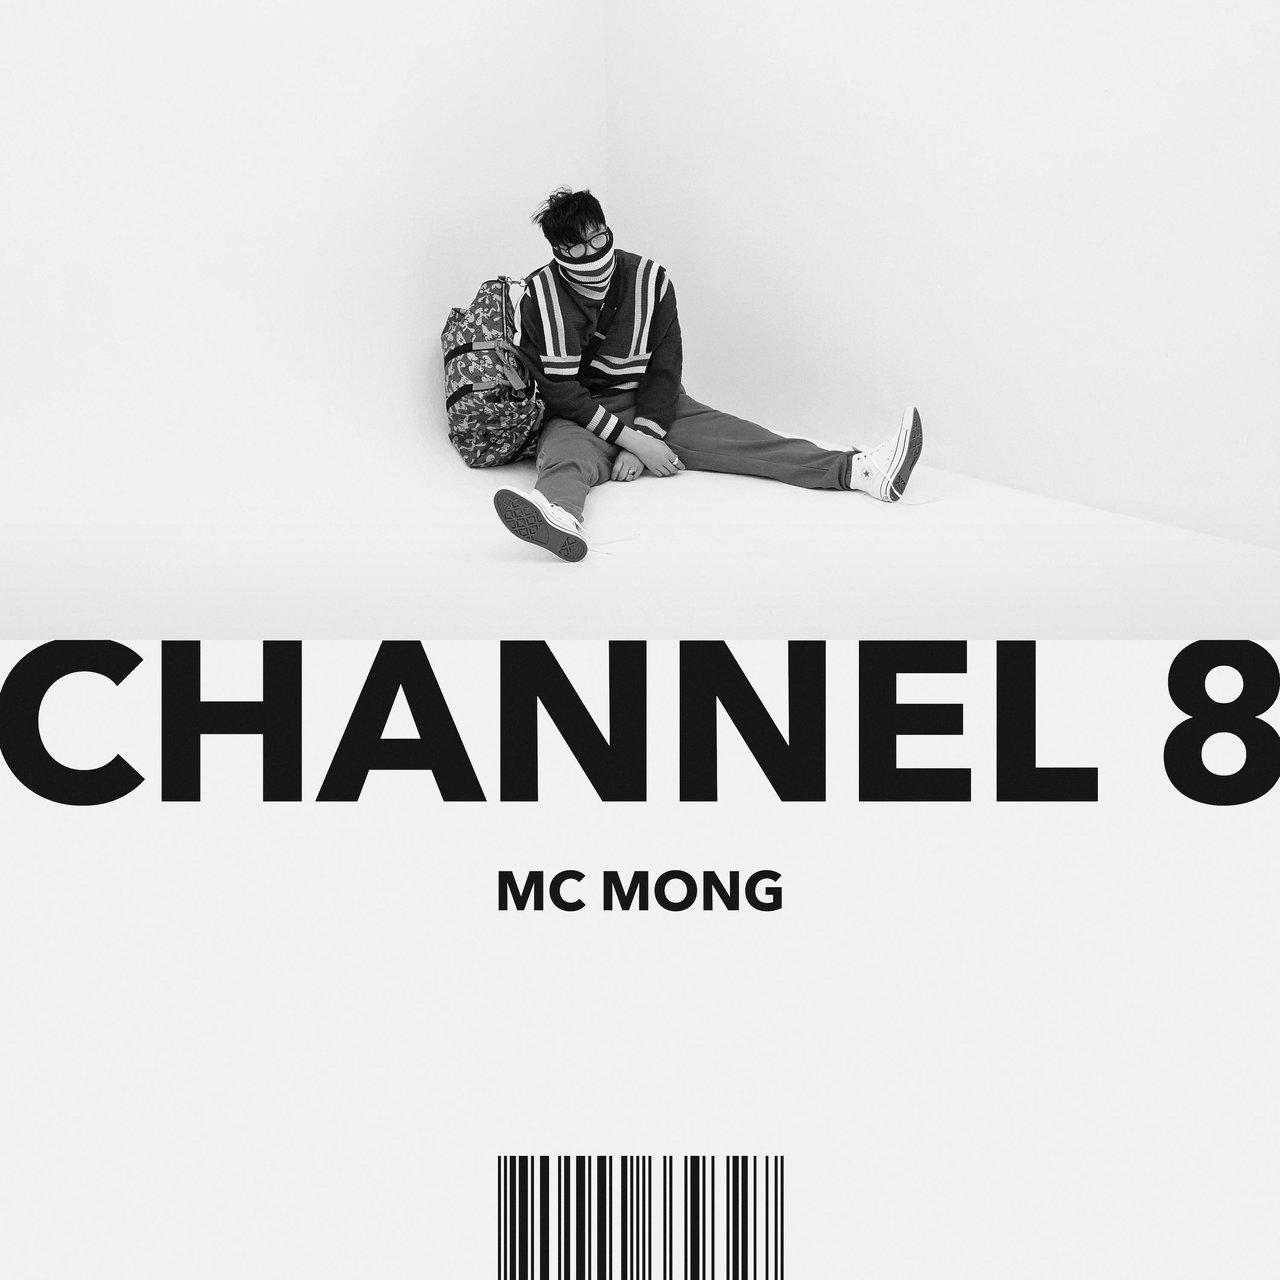 mc mong mc몽br《channel 8》brcd级无损44.1khz16bit